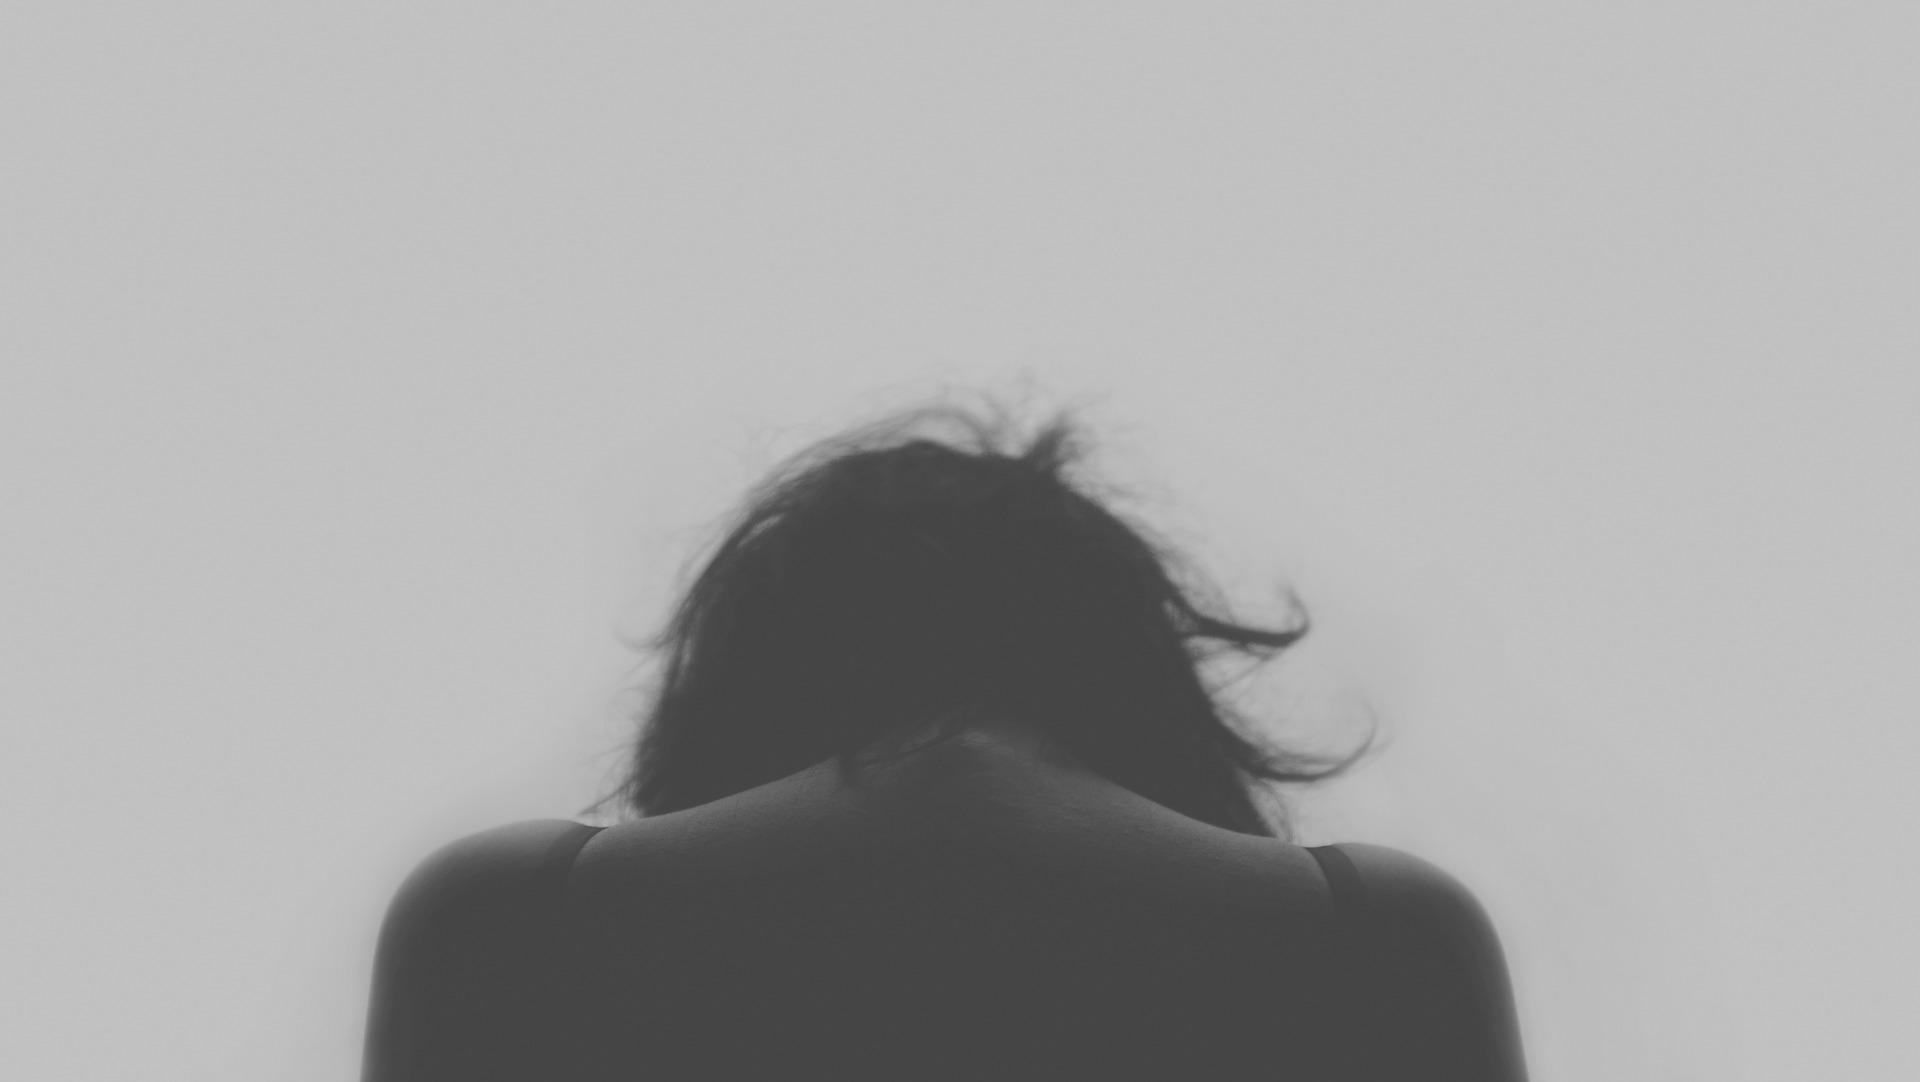 A God's-eye-view on mental health